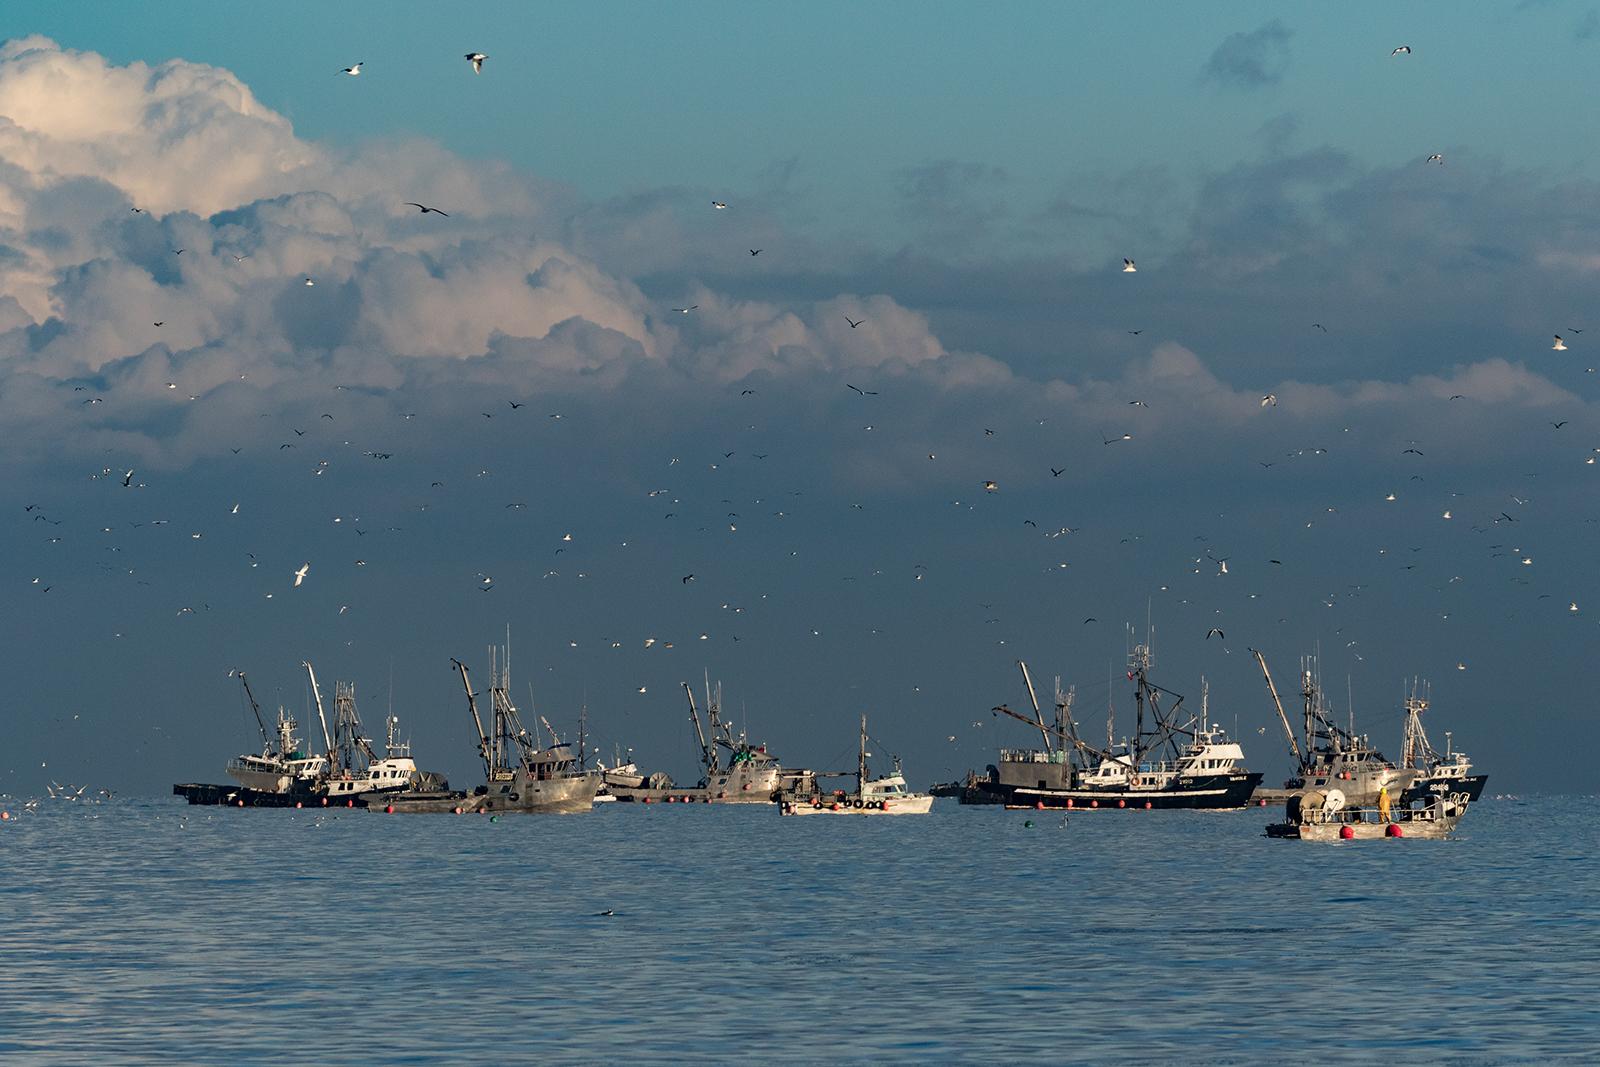 The Herring Fleet in Parksville Bay at dawn